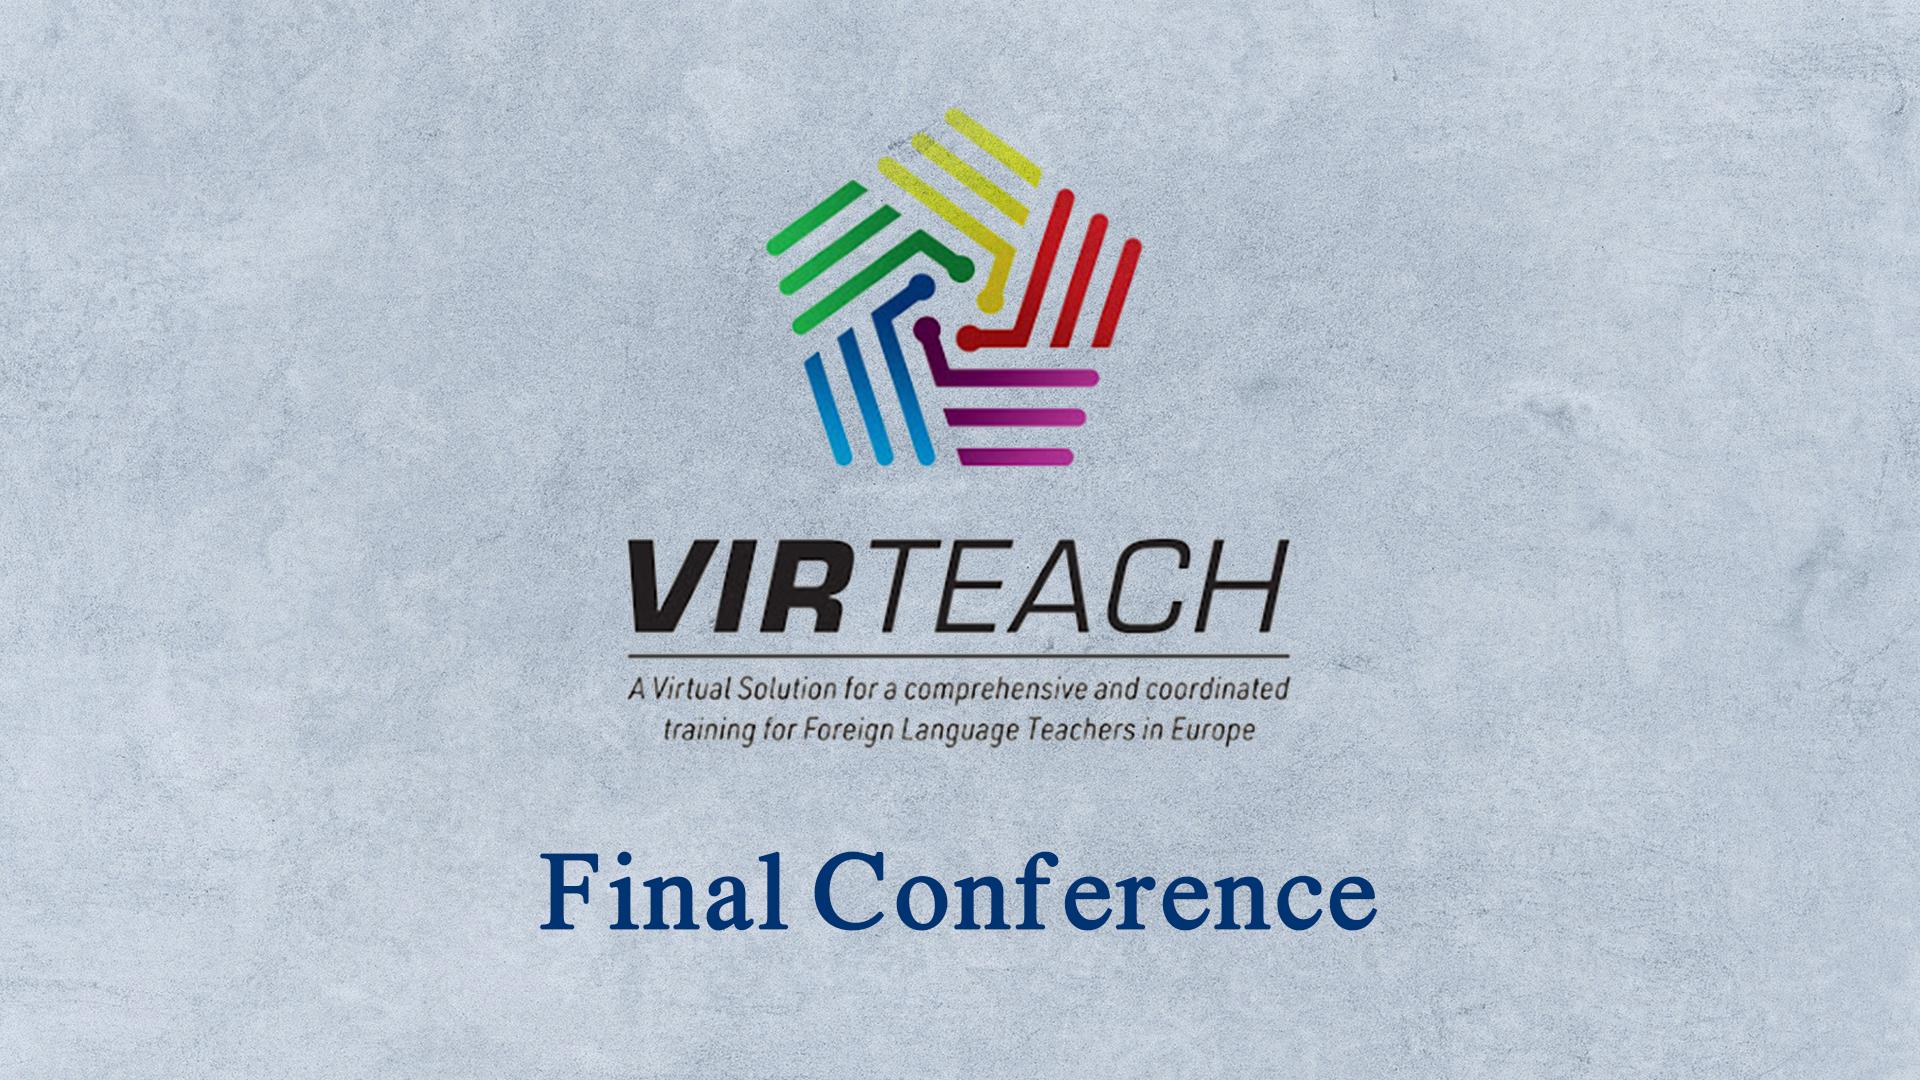 VIR_TEACH Final Conference